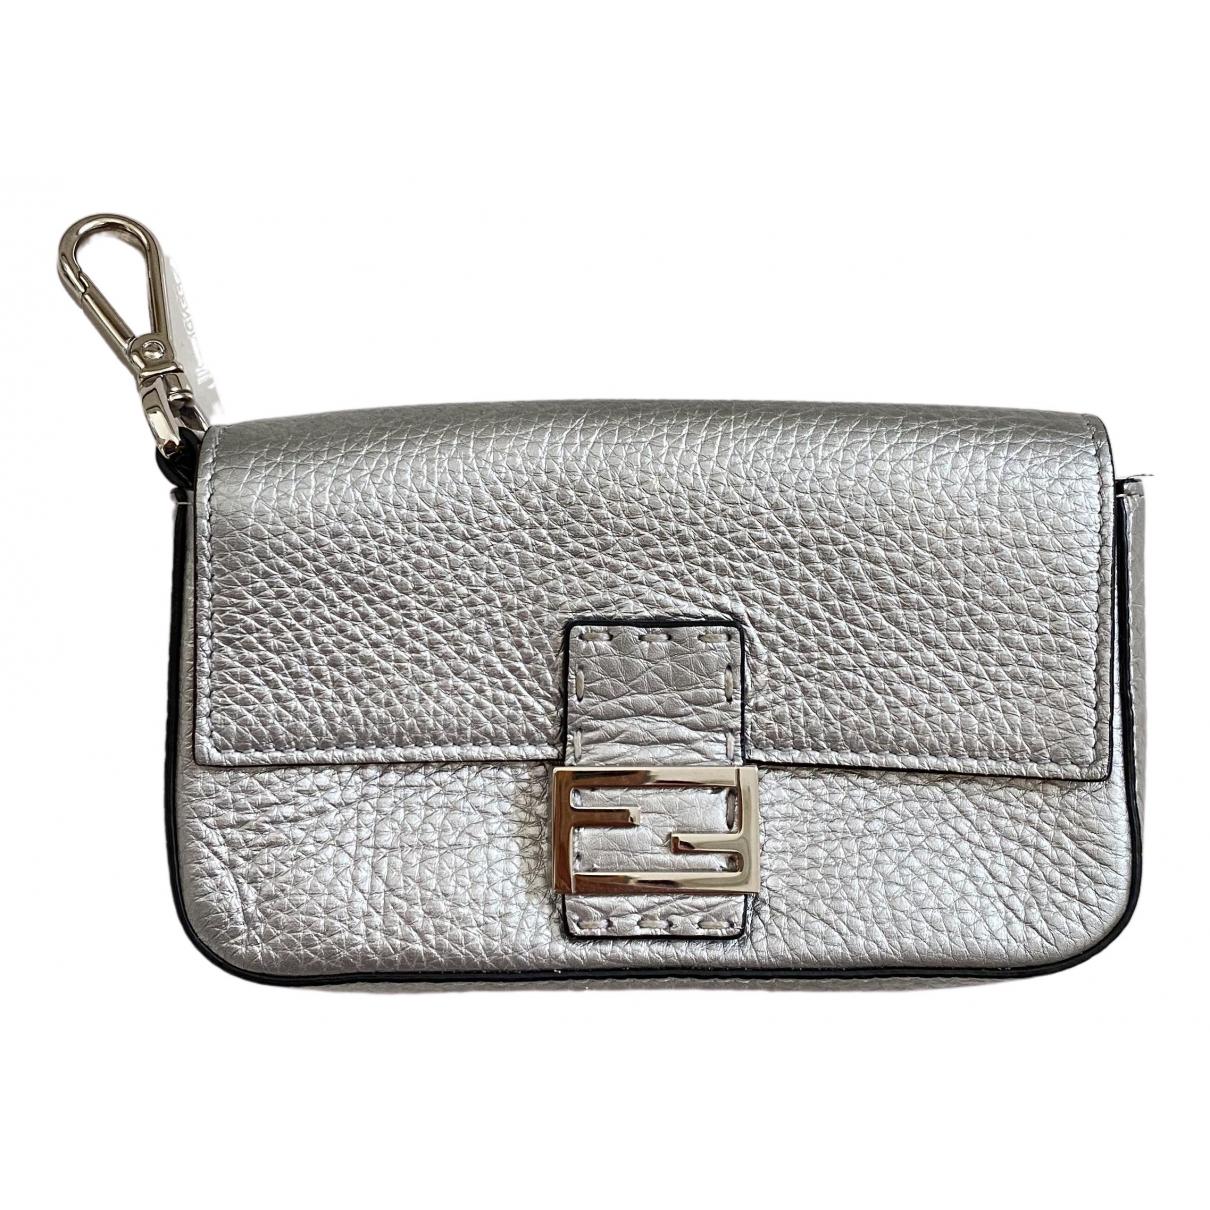 Fendi \N Silver Leather bag for Men \N